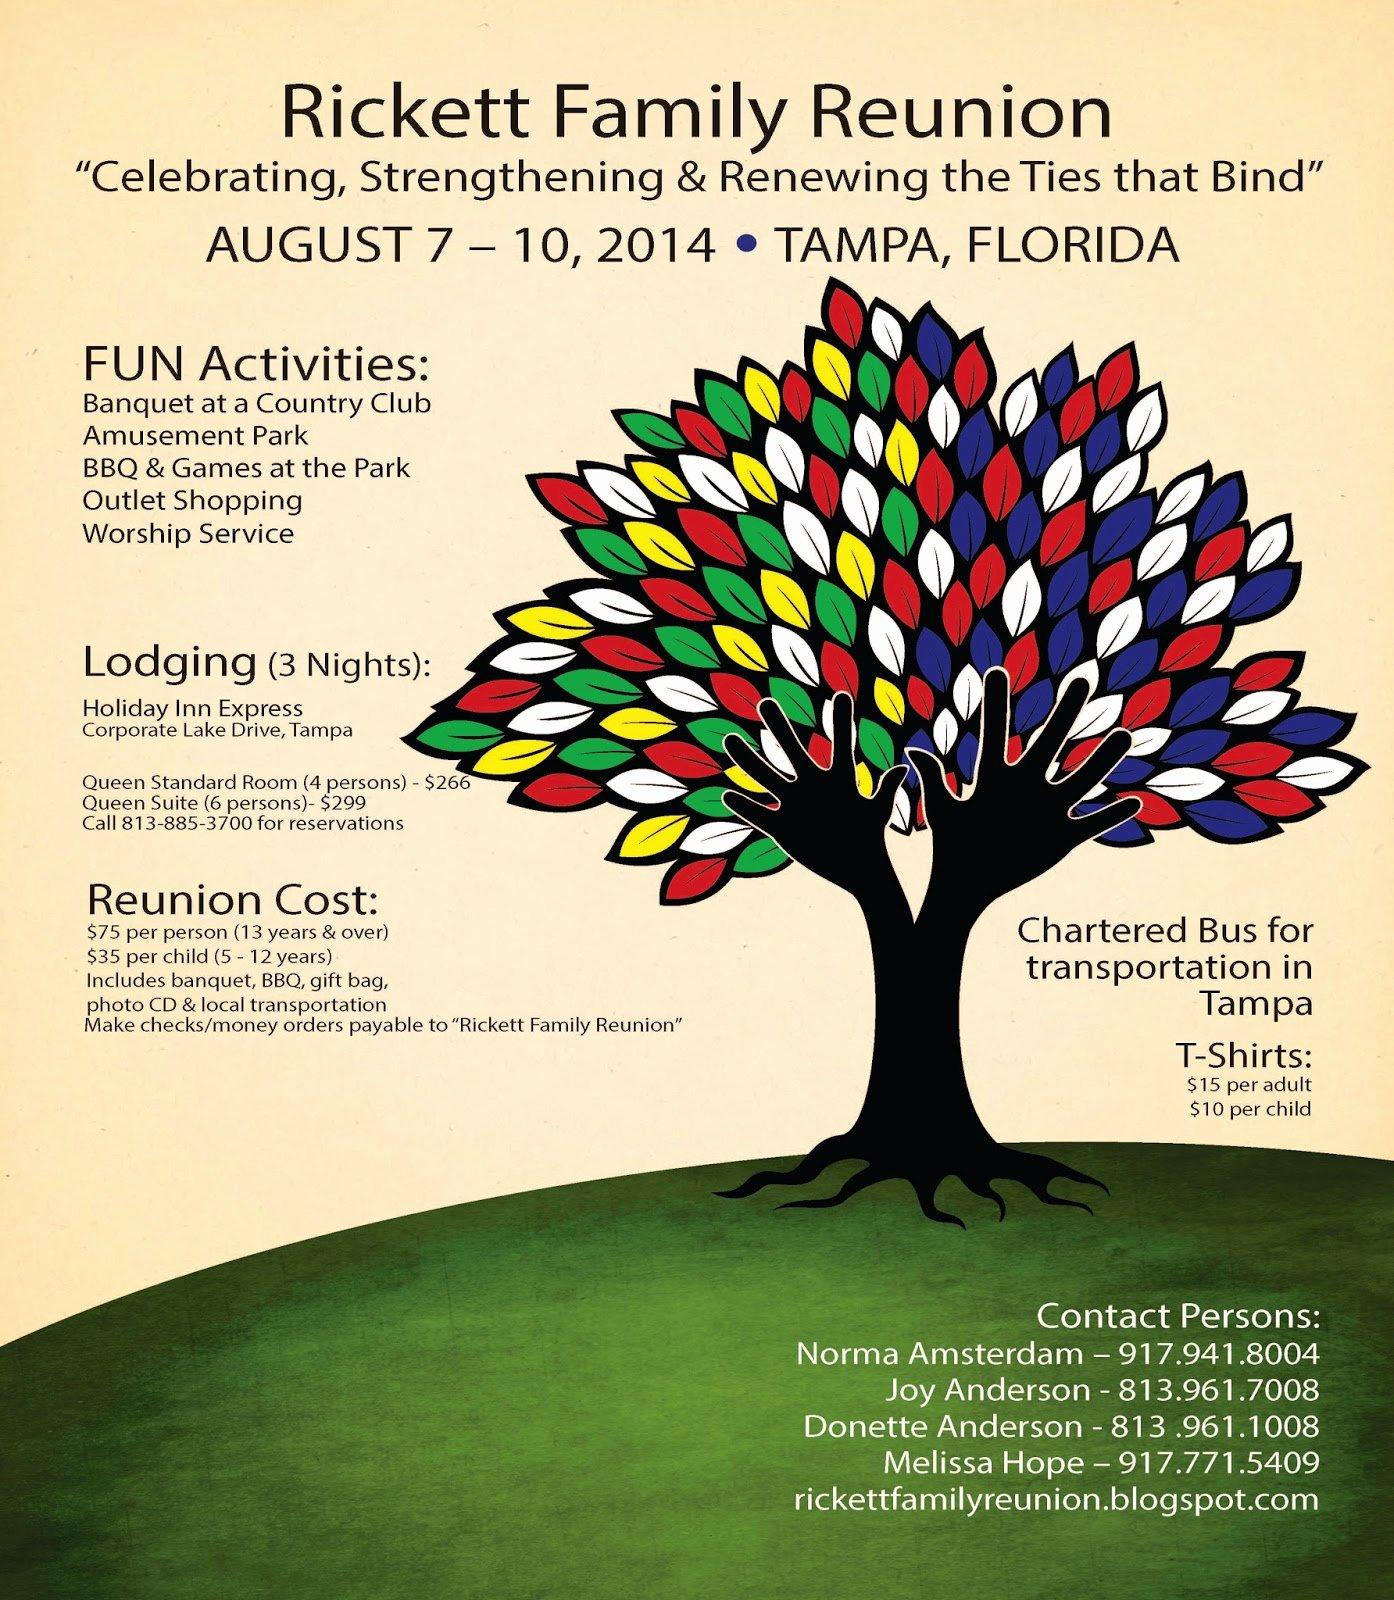 Family Reunion Flyer Template Elegant Rickett Family Reunion Blog